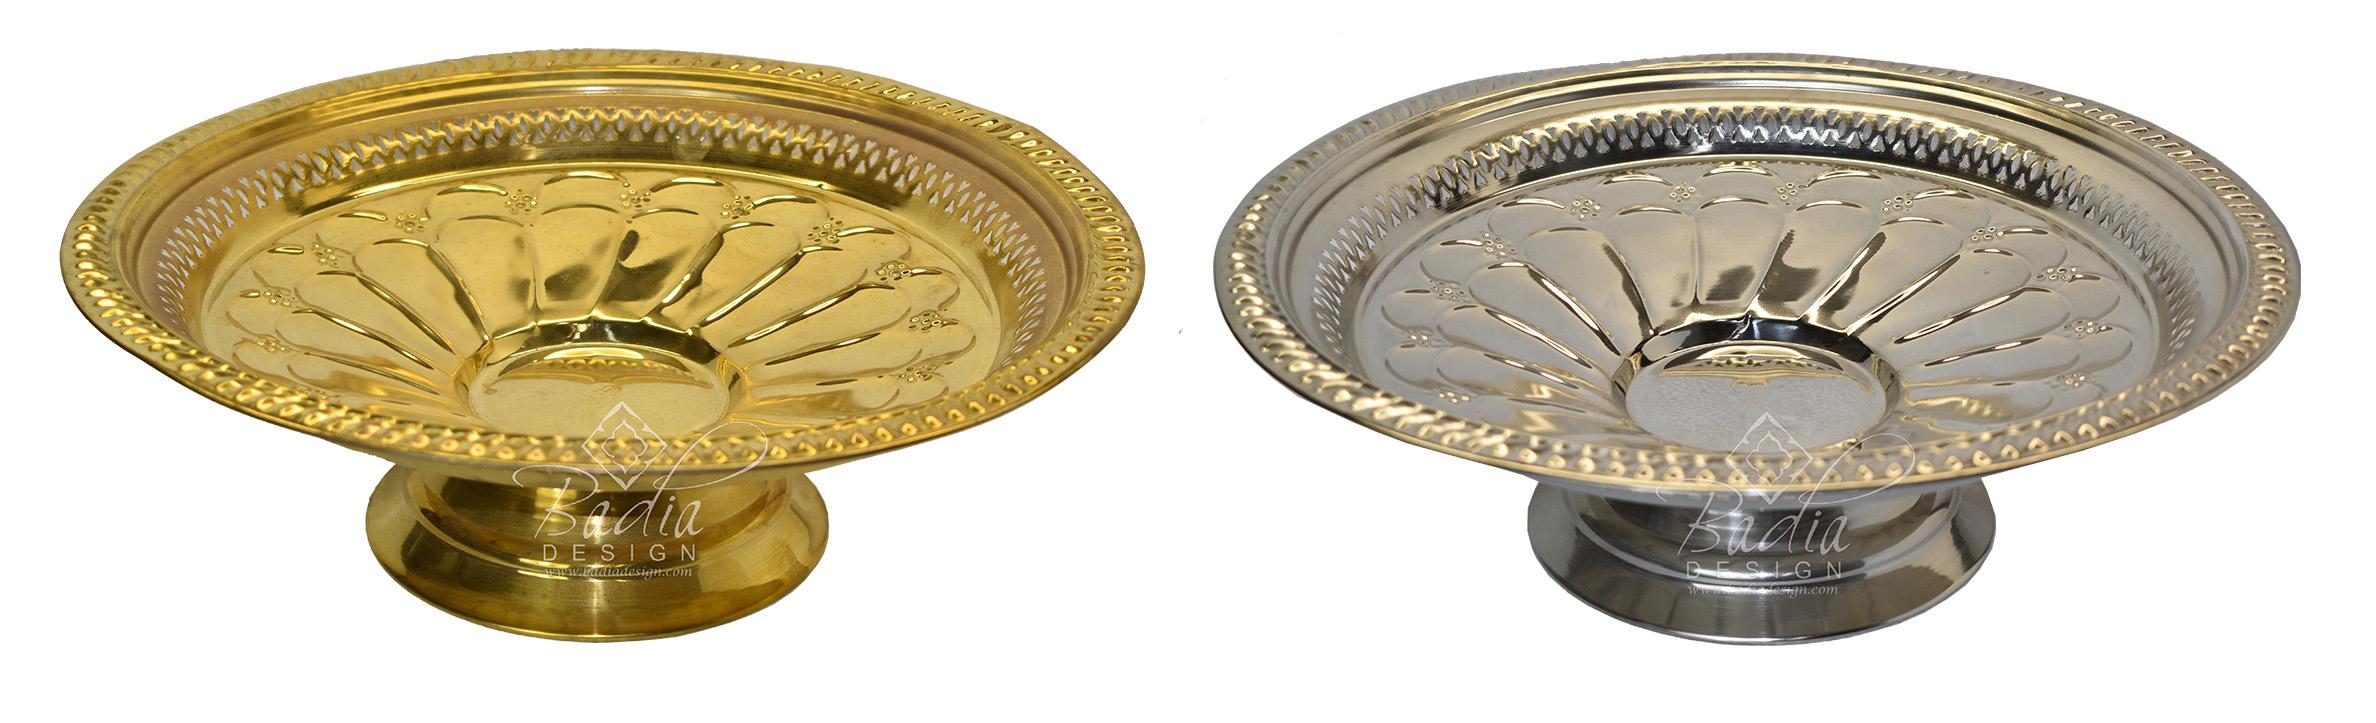 moroccan-round-brass-silver-serving-trays-hd2472.jpg